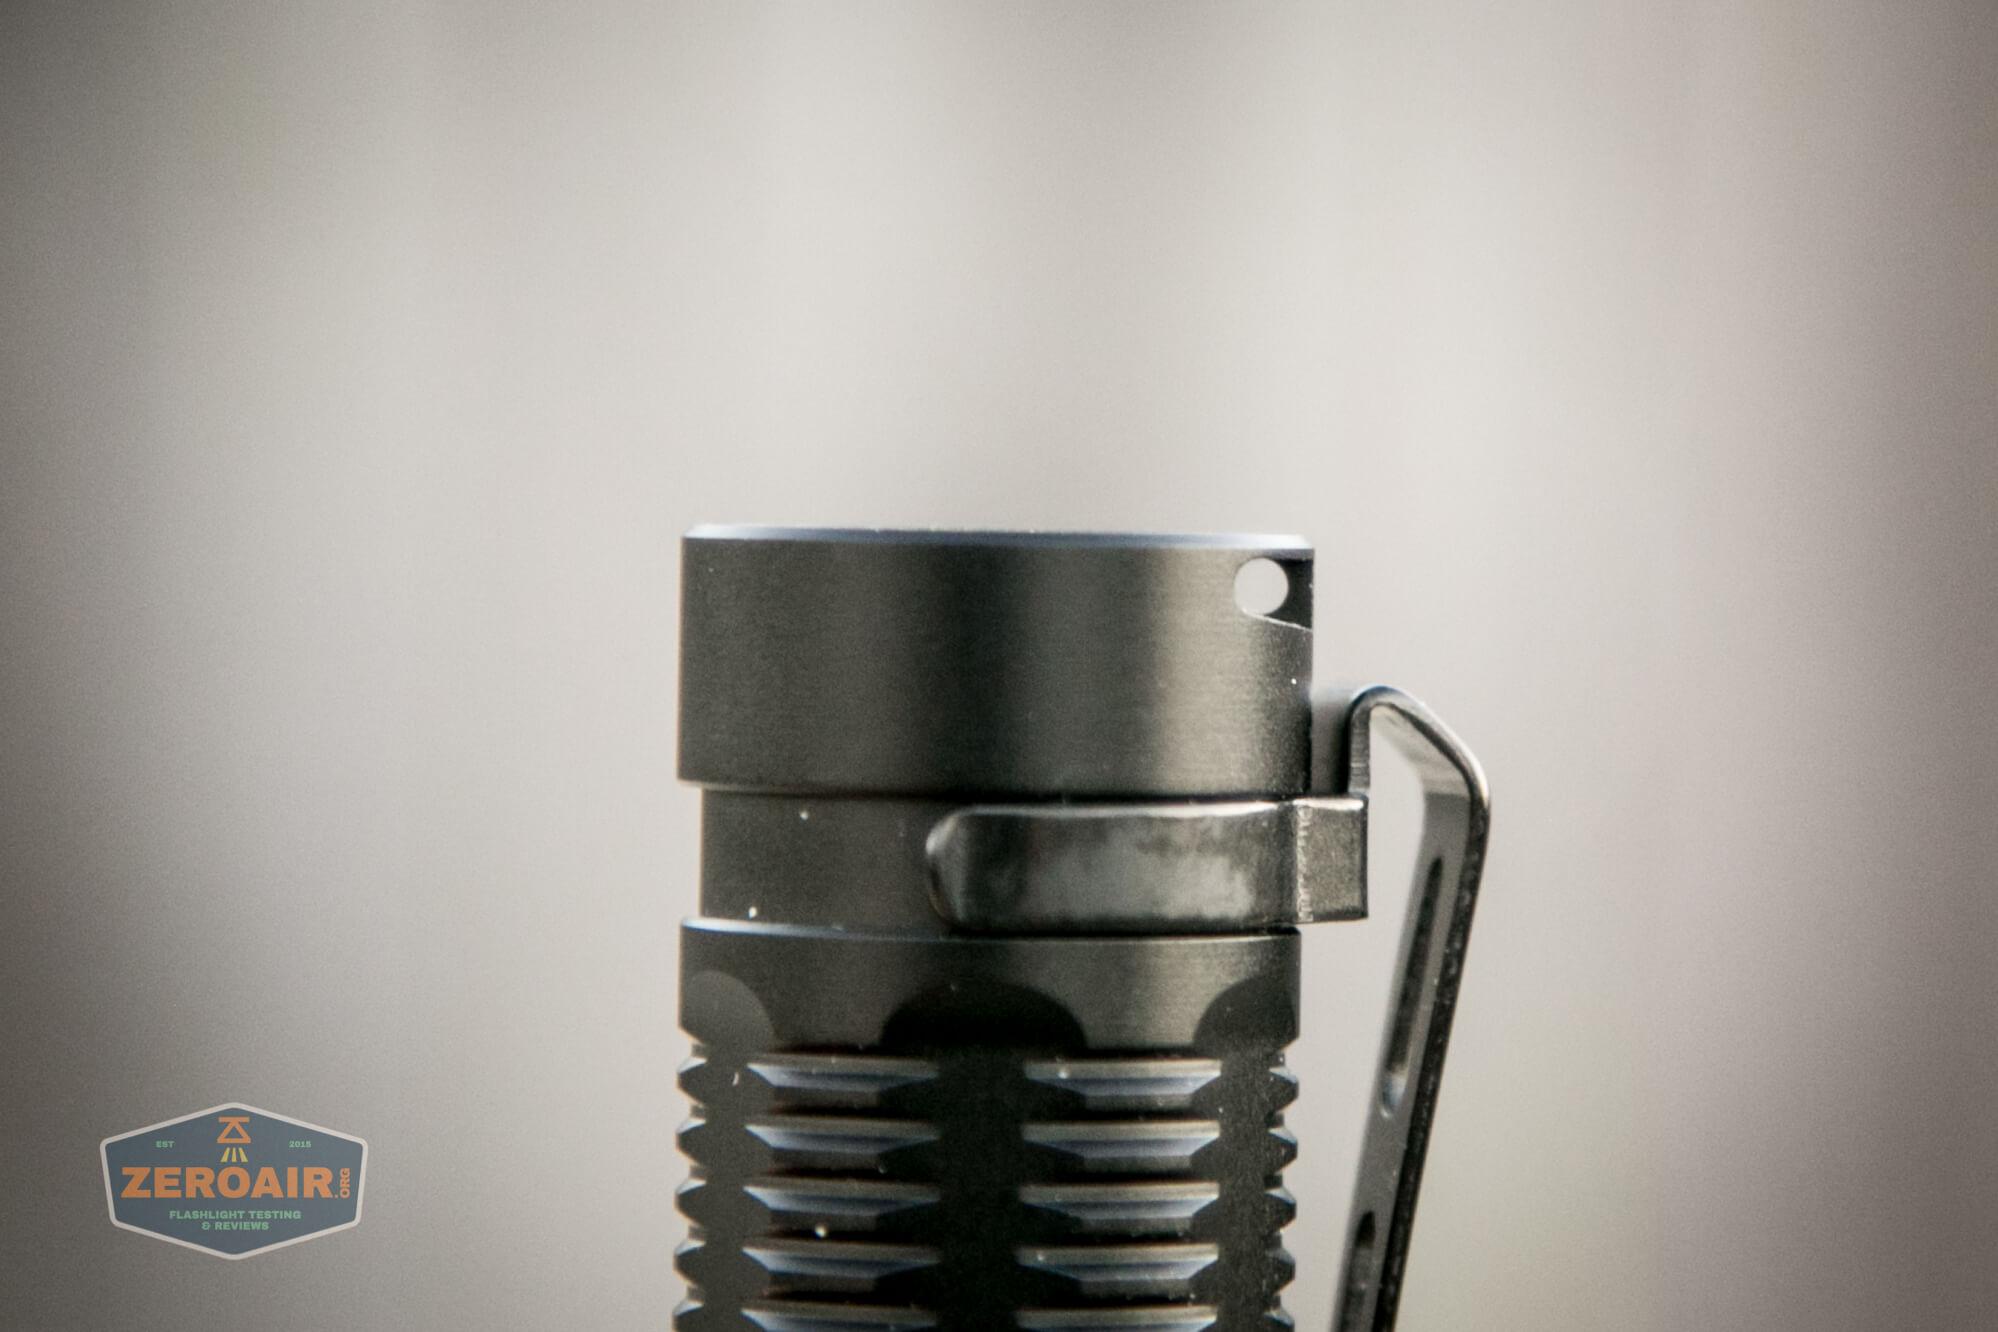 klarus g25 21700 cree xhp70.2 flashlight lanyard hole